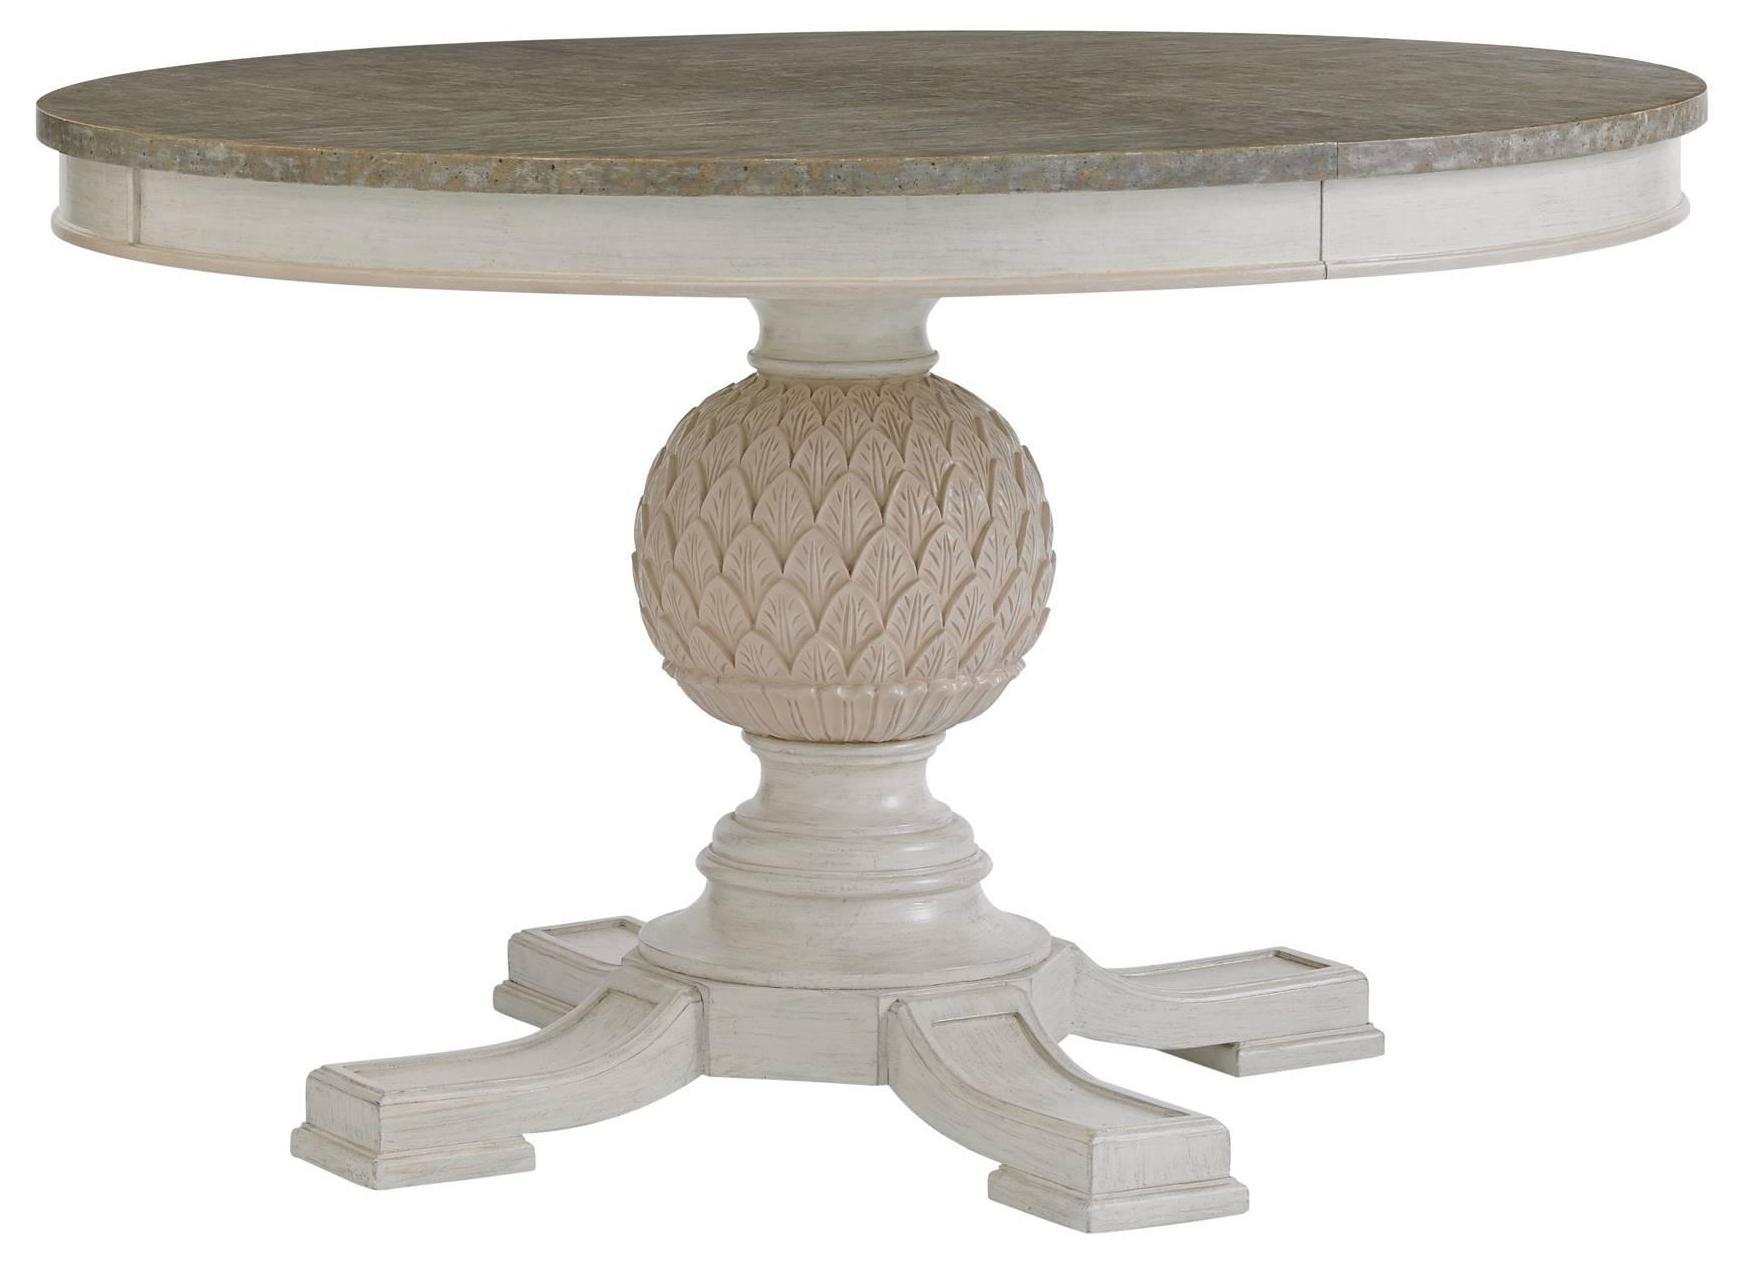 Stanley Furniture Preserve Artichoke Pedestal Table With Leaf